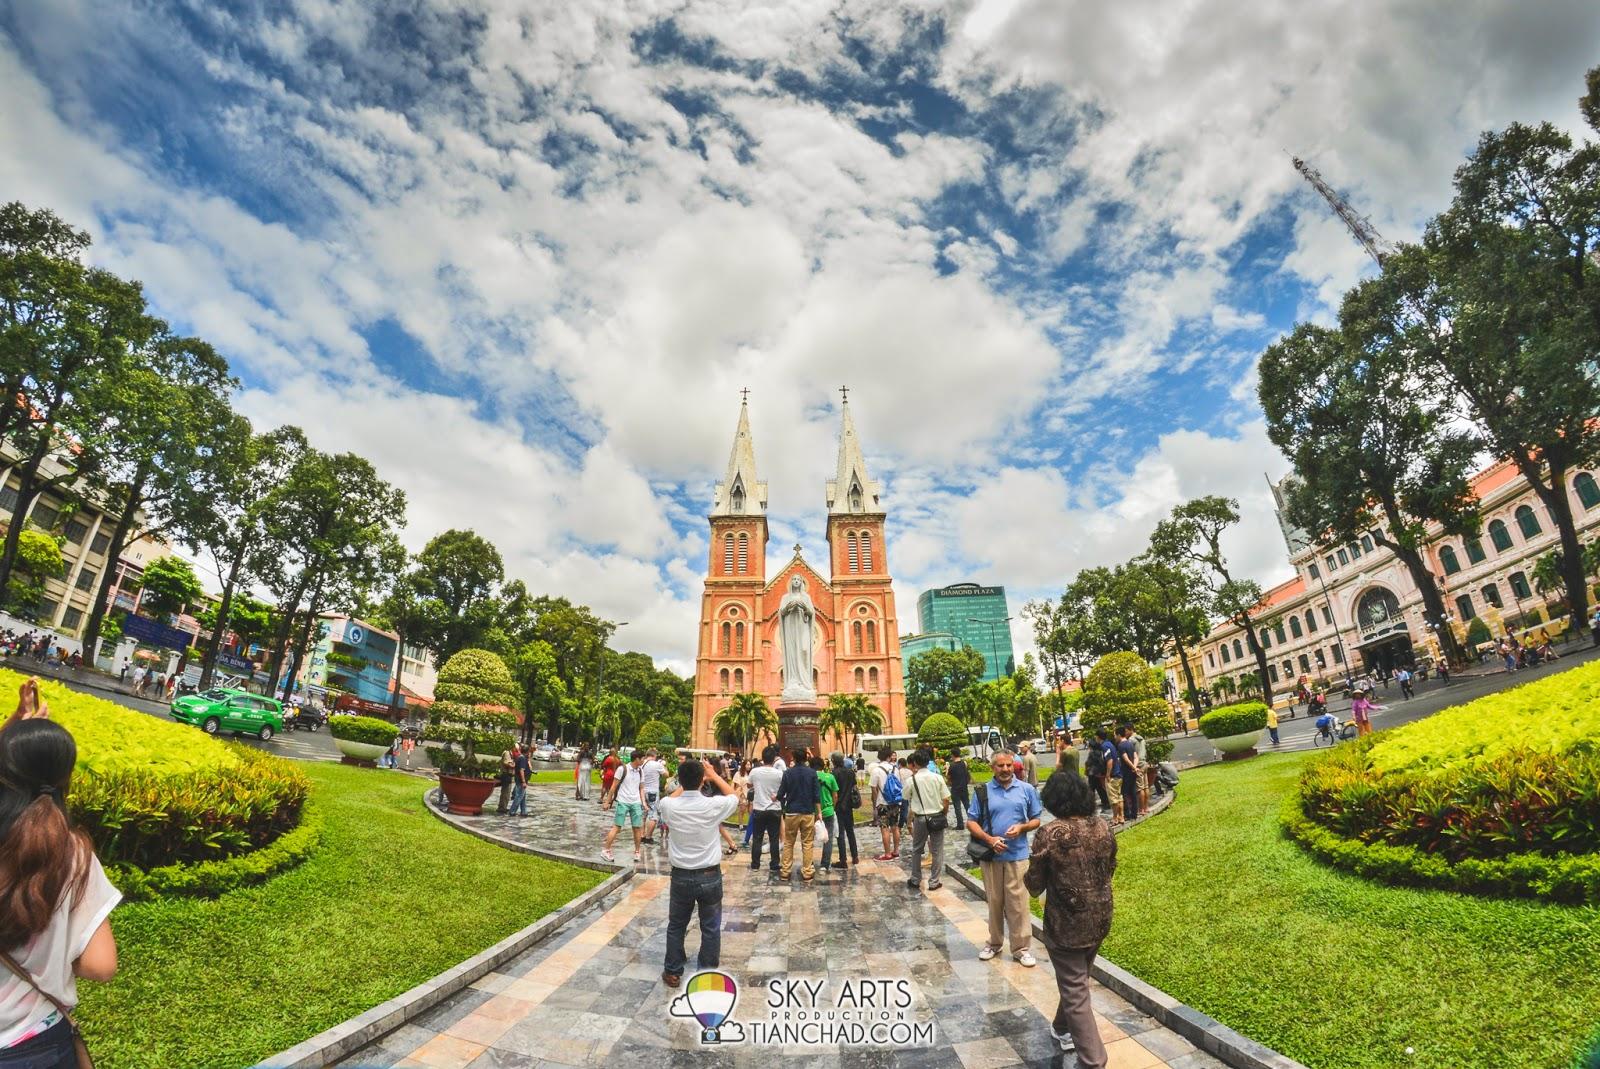 Notre Dame Cathedral in Saigon, Vietnam (2014)